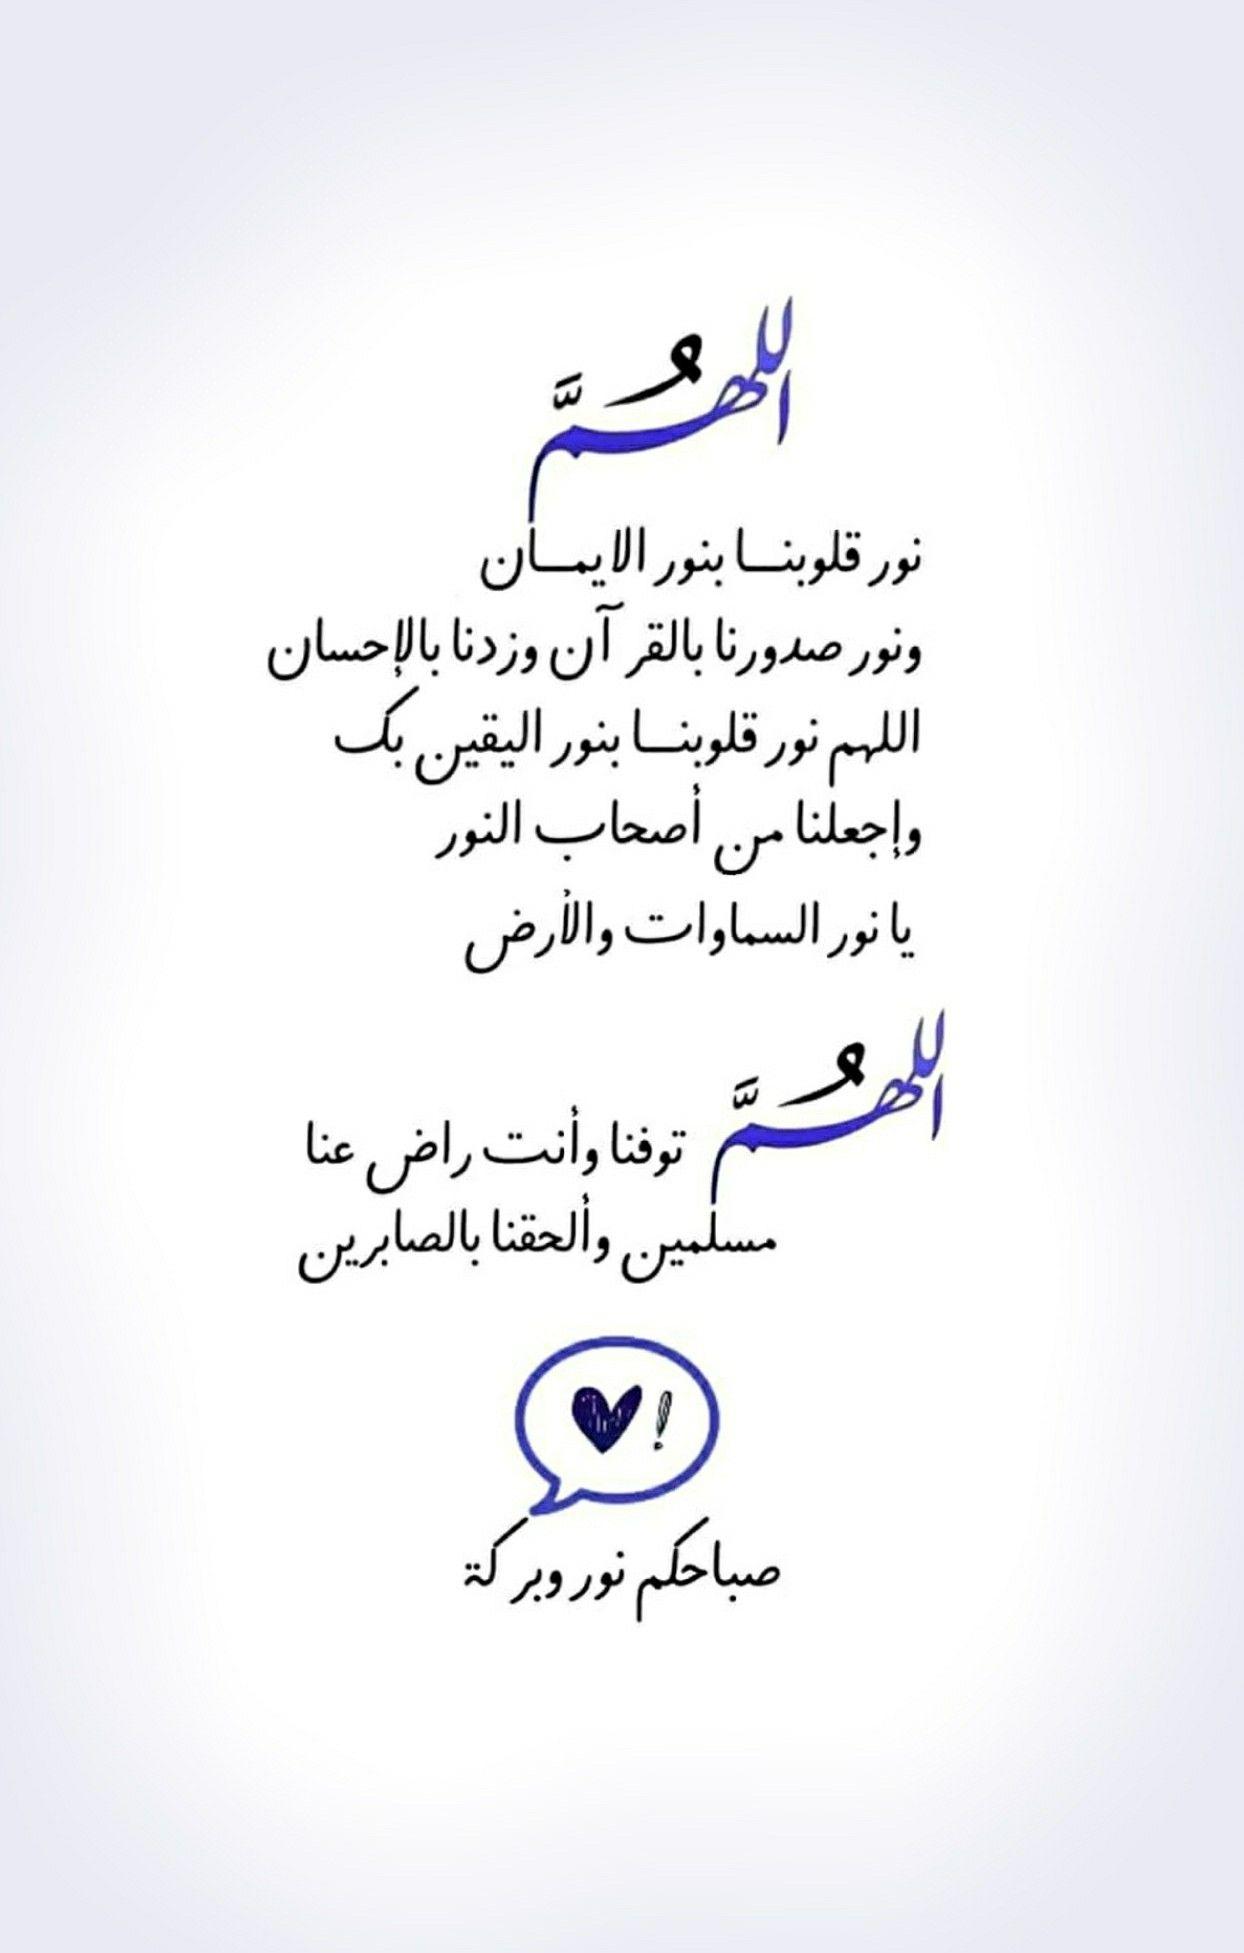 الله م نور قلوبنـــا بنور الايمـــان ونور صدورنا بالقرآن وزدنا بالإحسان اللهم نور قلوبنـــا بنو Good Morning Arabic Good Morning Greetings Islamic Quotes